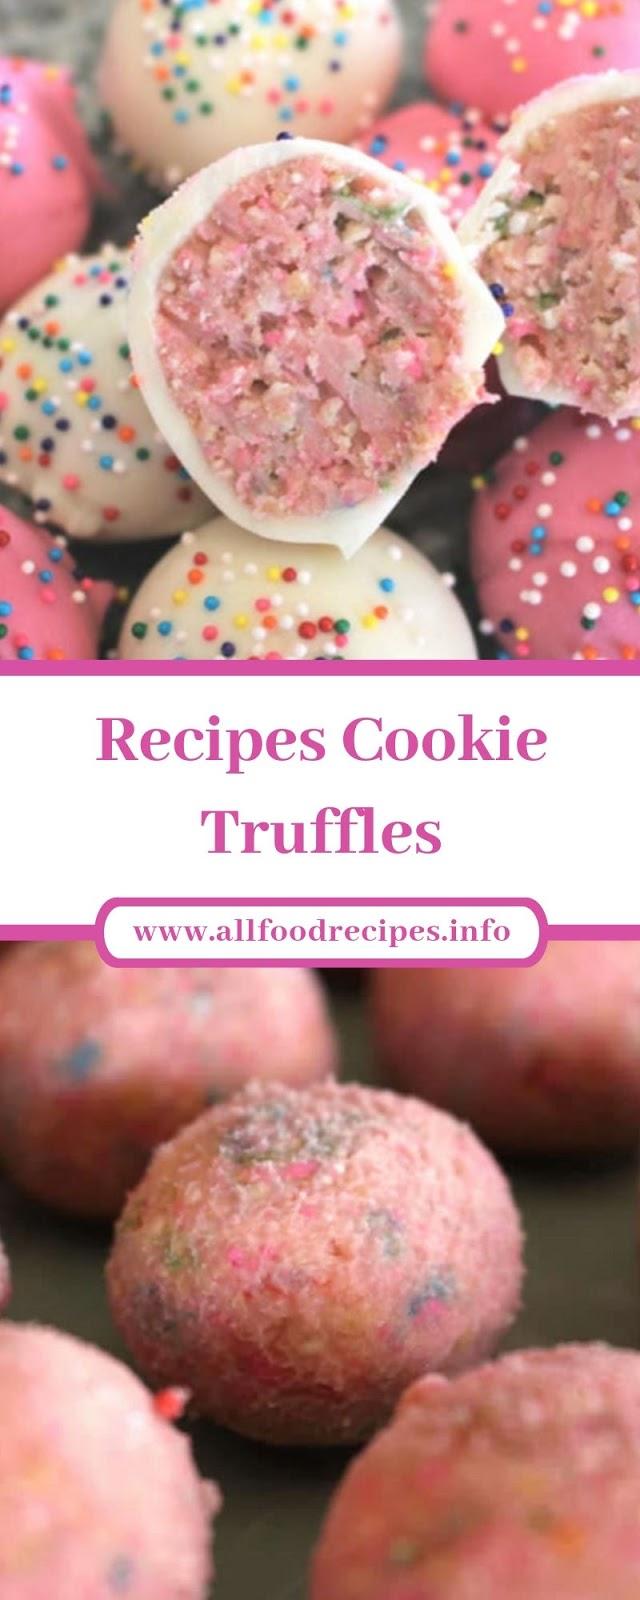 Recipes Cookie Truffles